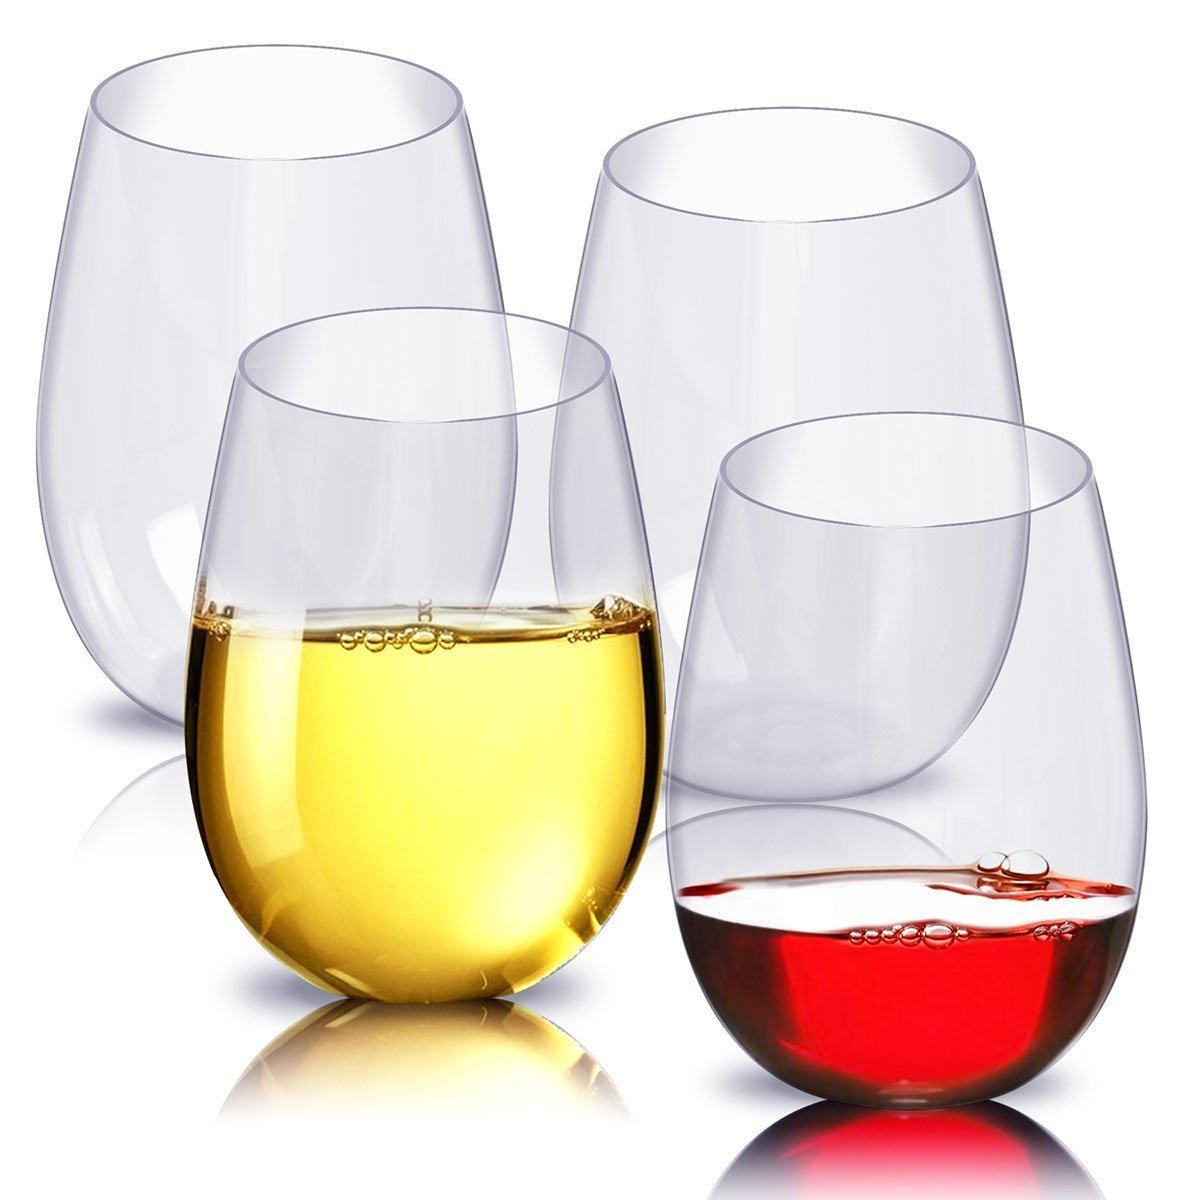 JYPC Unbreakable Stemless Wine Glasses,100% Tritan Shatterproof Plastic Wine Glass,16 OZ(Set of 4)